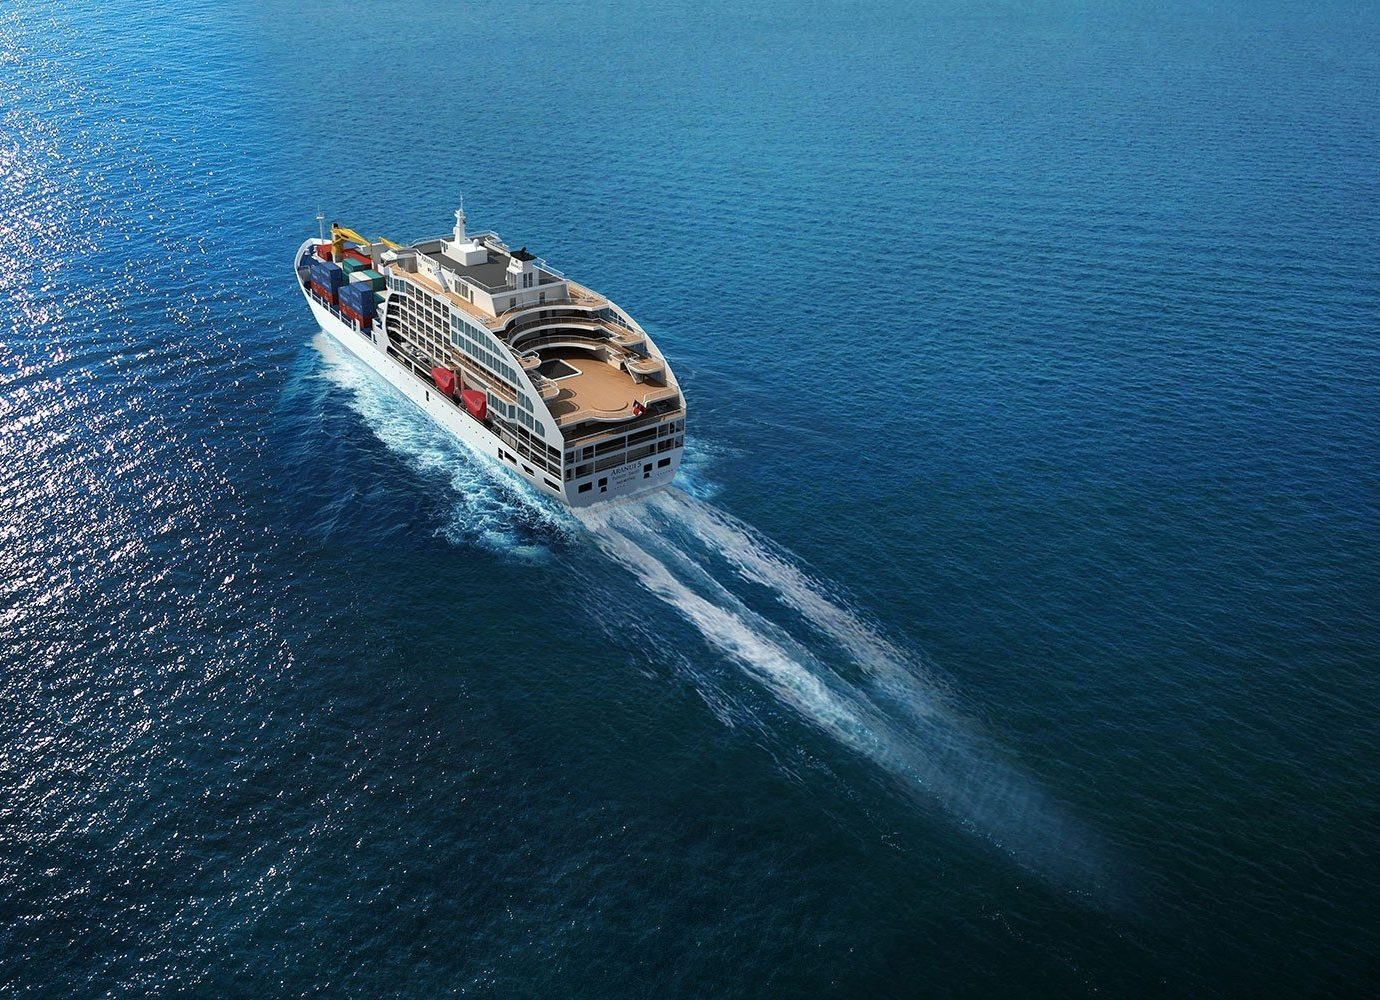 Cruise Travel Trip Ideas water outdoor sky vehicle Boat passenger ship ship Sea cruise ship luxury yacht Ocean watercraft yacht wave traveling